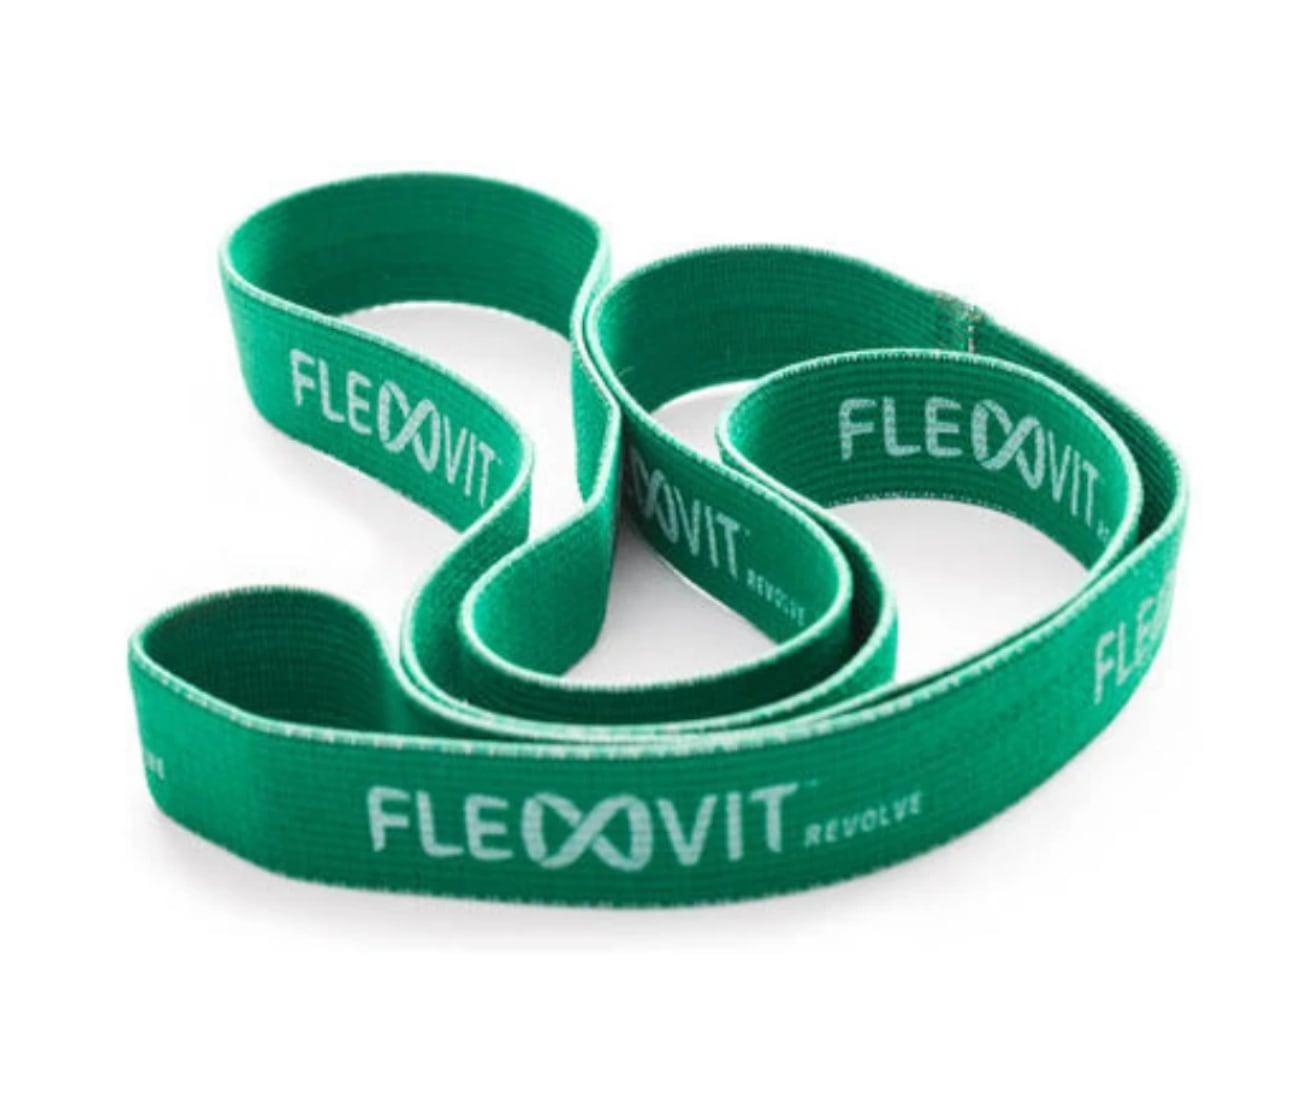 FLEXVIT REVOLVE -フレックスヴィット レボルヴ ストレッチバンド